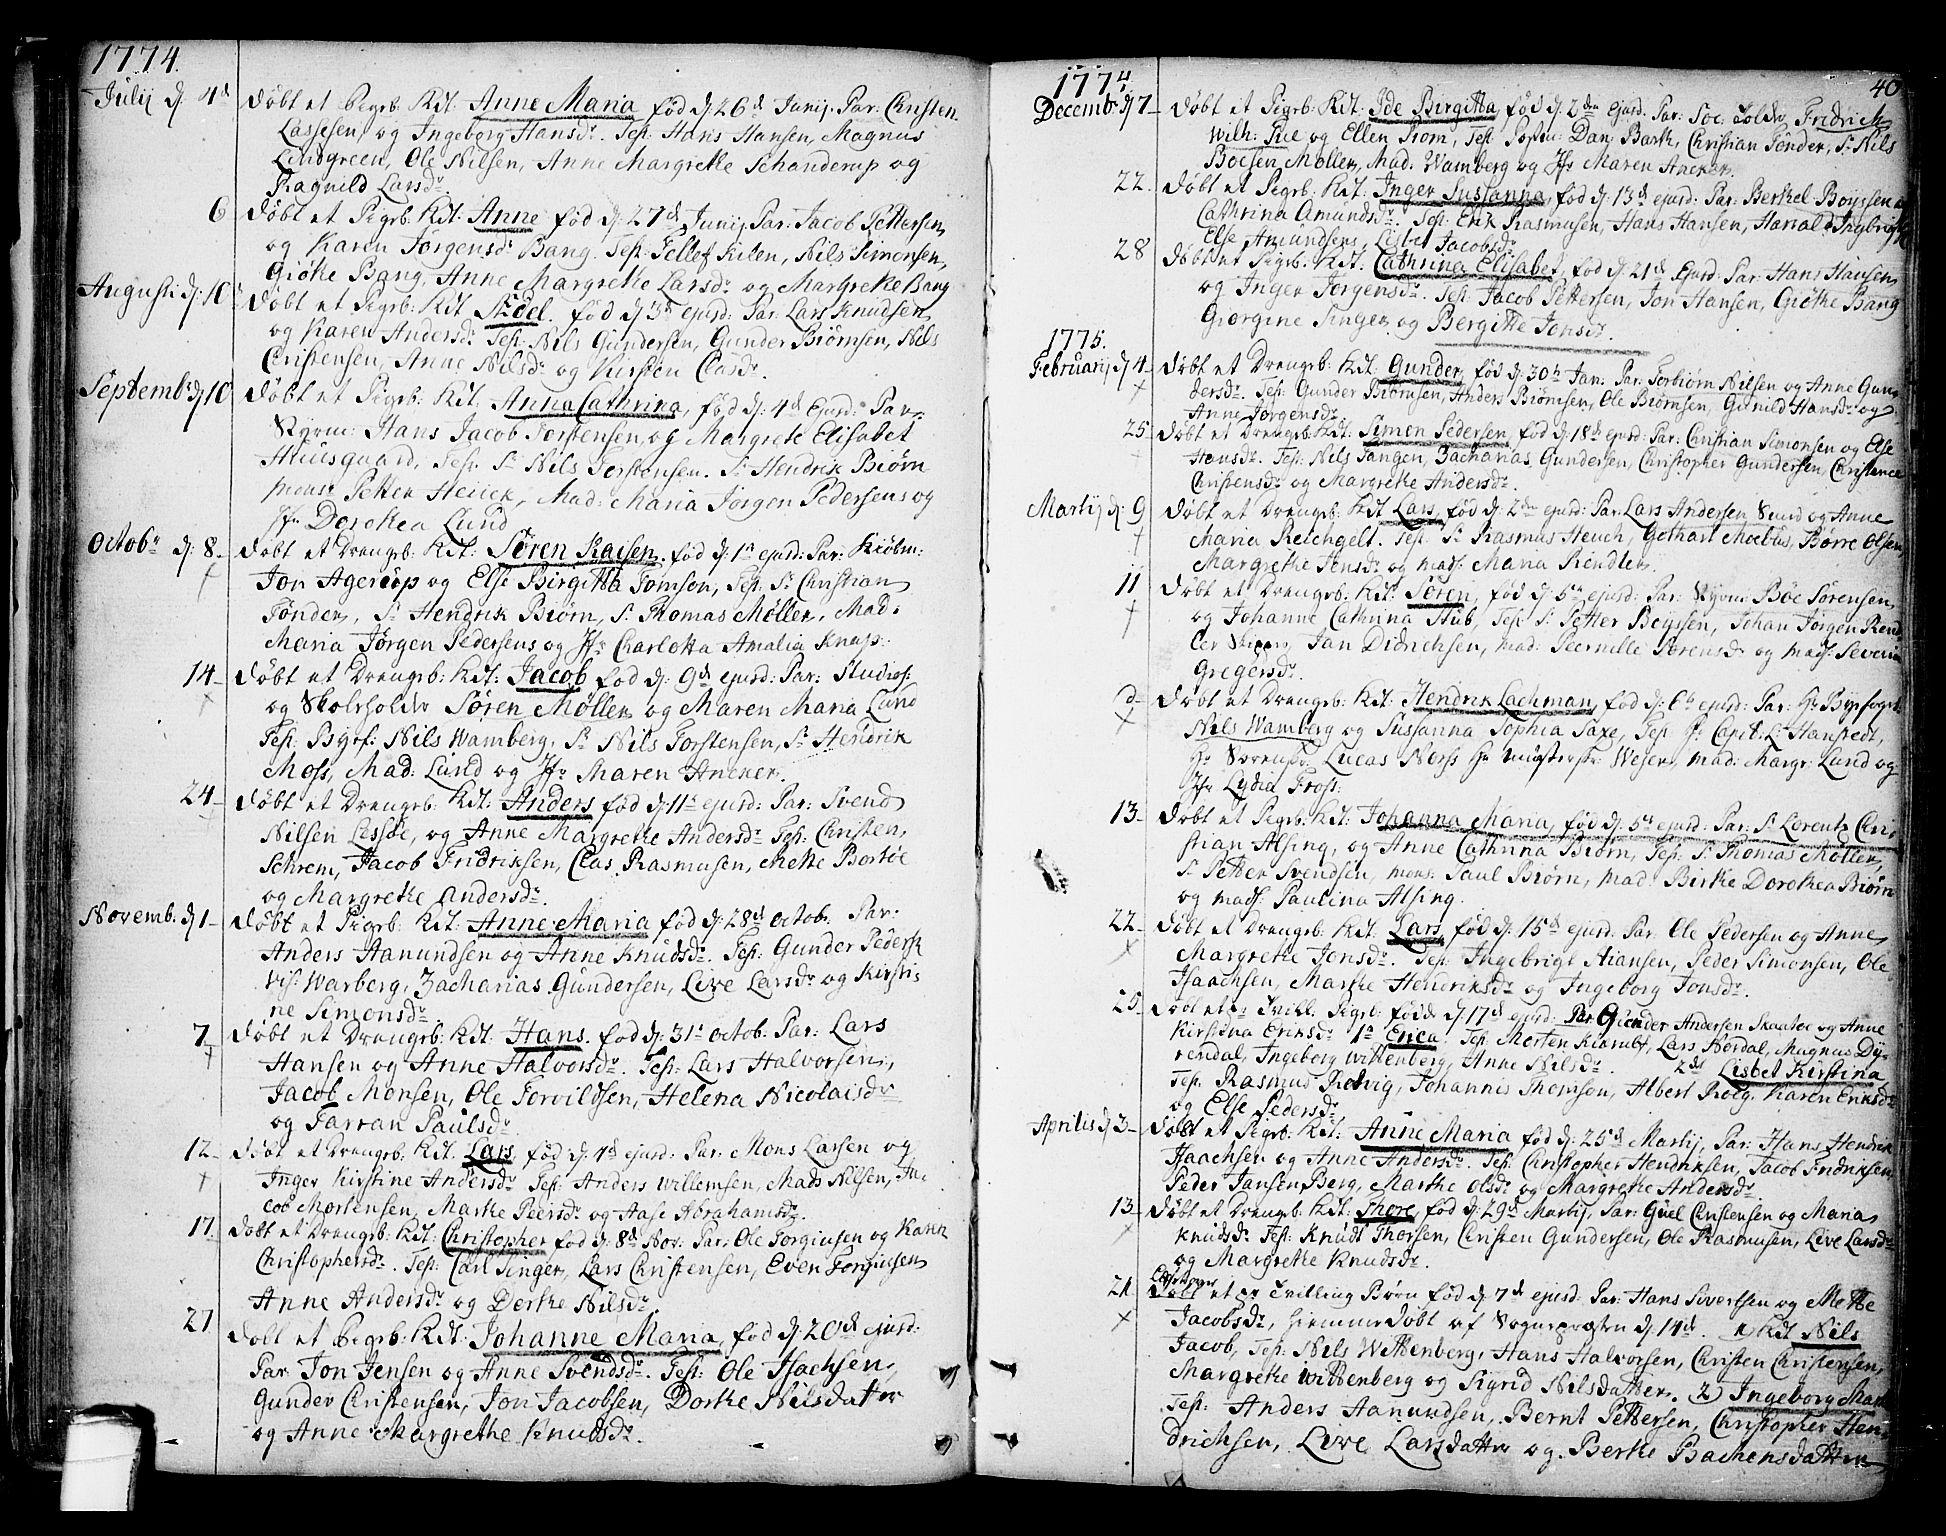 SAKO, Kragerø kirkebøker, F/Fa/L0002: Ministerialbok nr. 2, 1767-1802, s. 40